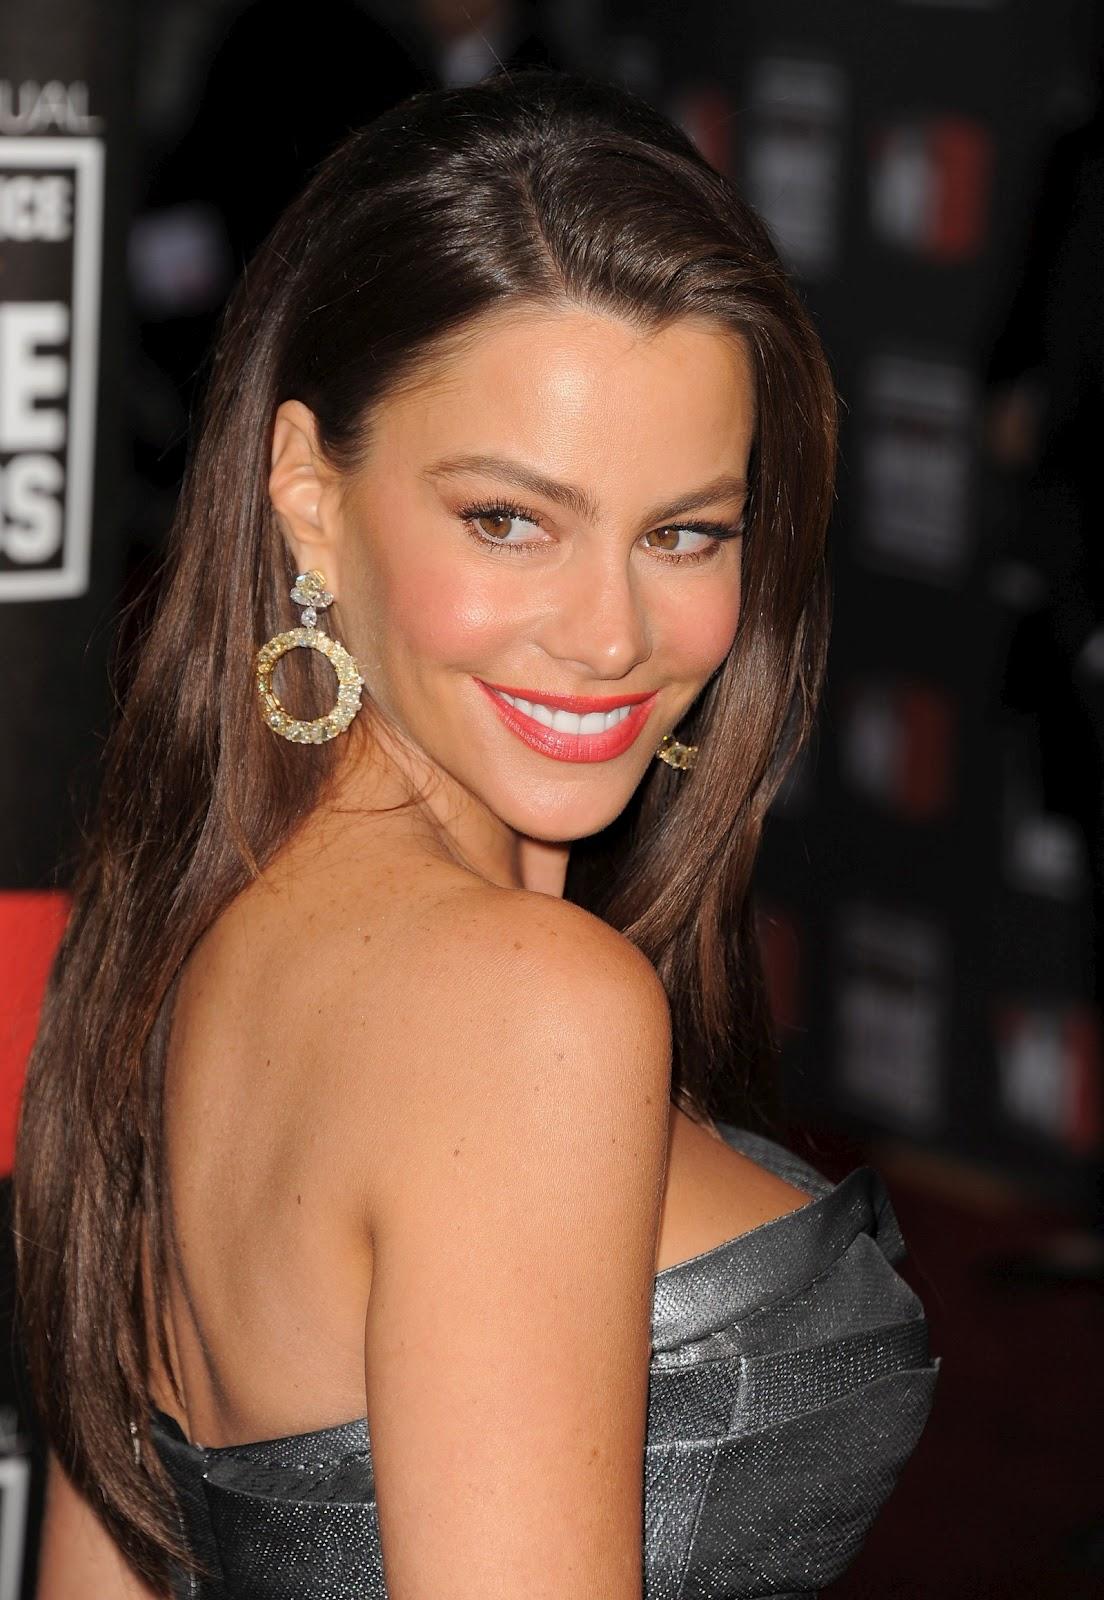 Sofia Vergara  Celebrity beauty and style